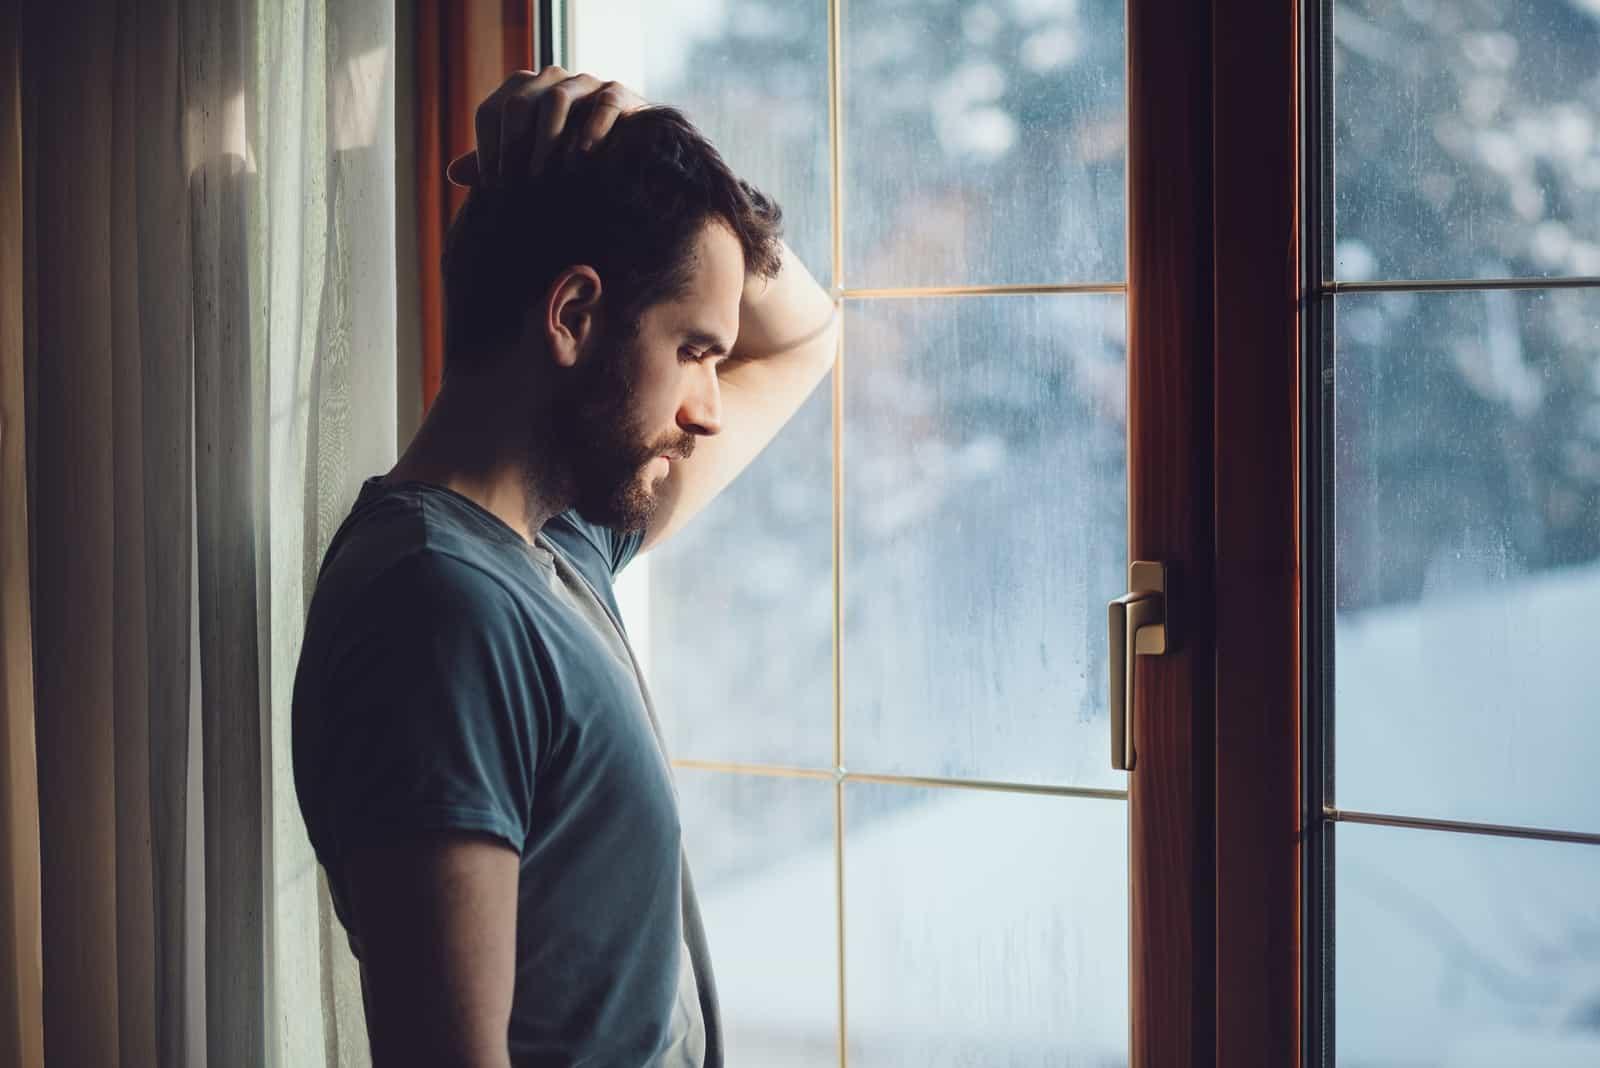 sad man standing near window during daytime